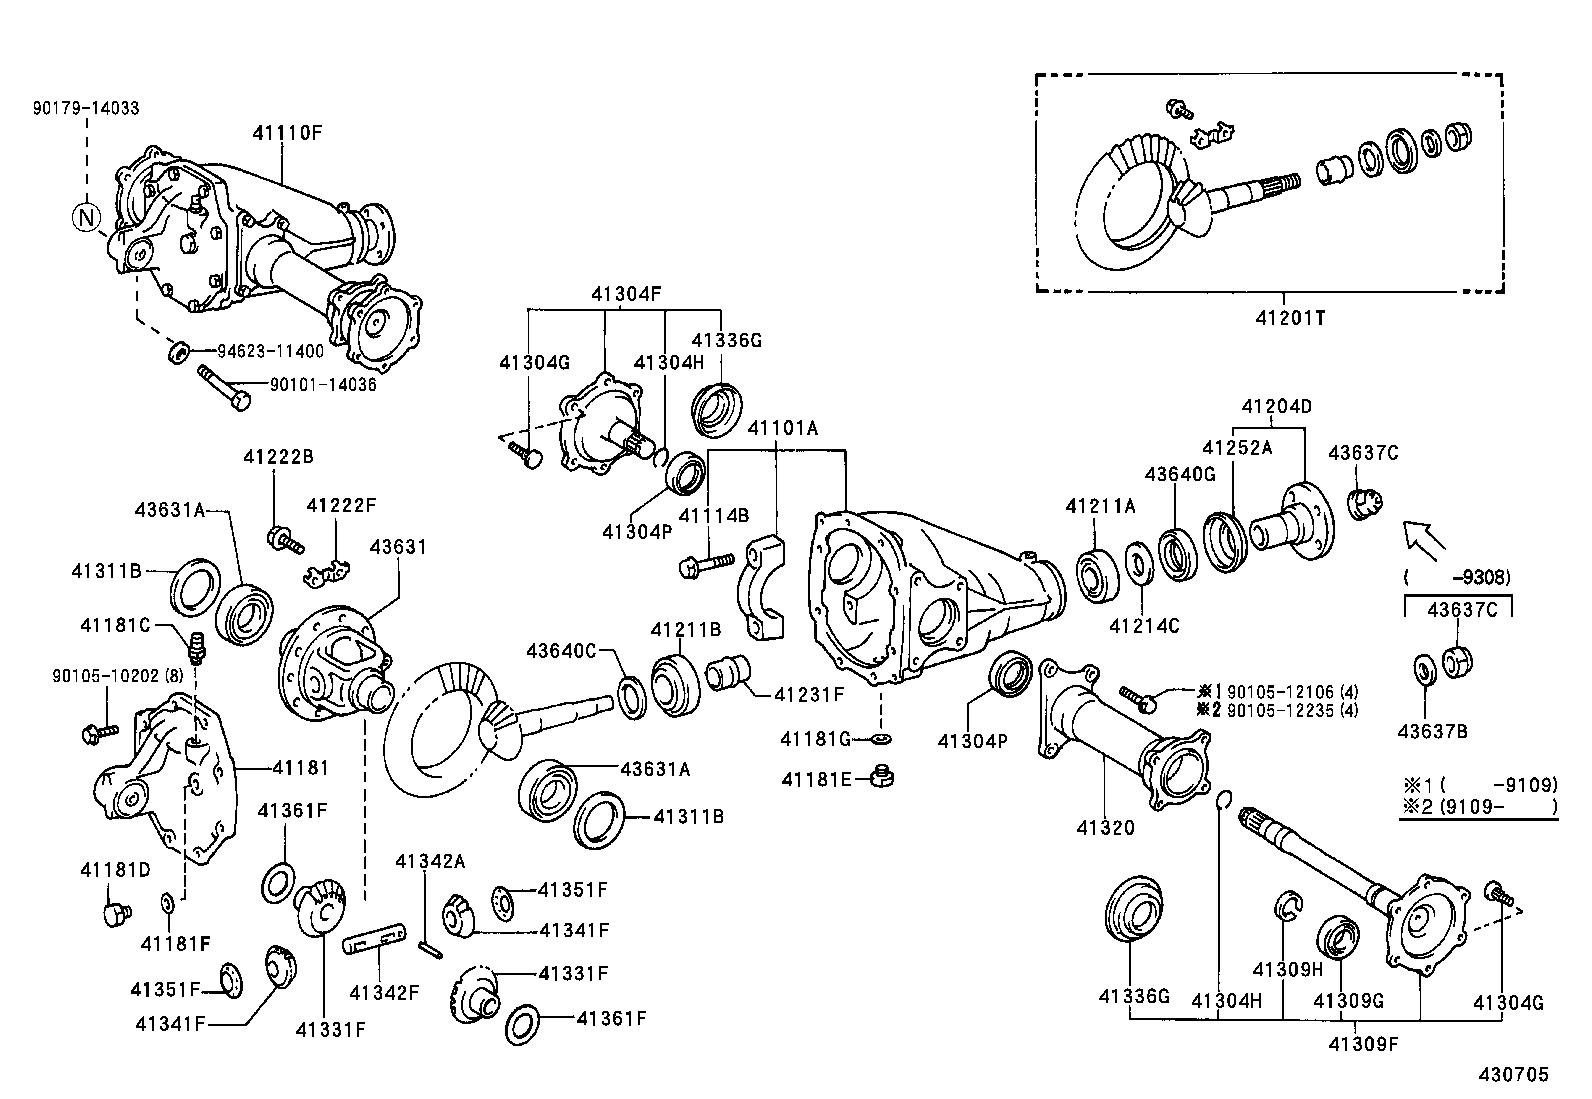 [DOWNLOAD] 1991 Toyota Previa Engine Diagram Full Quality